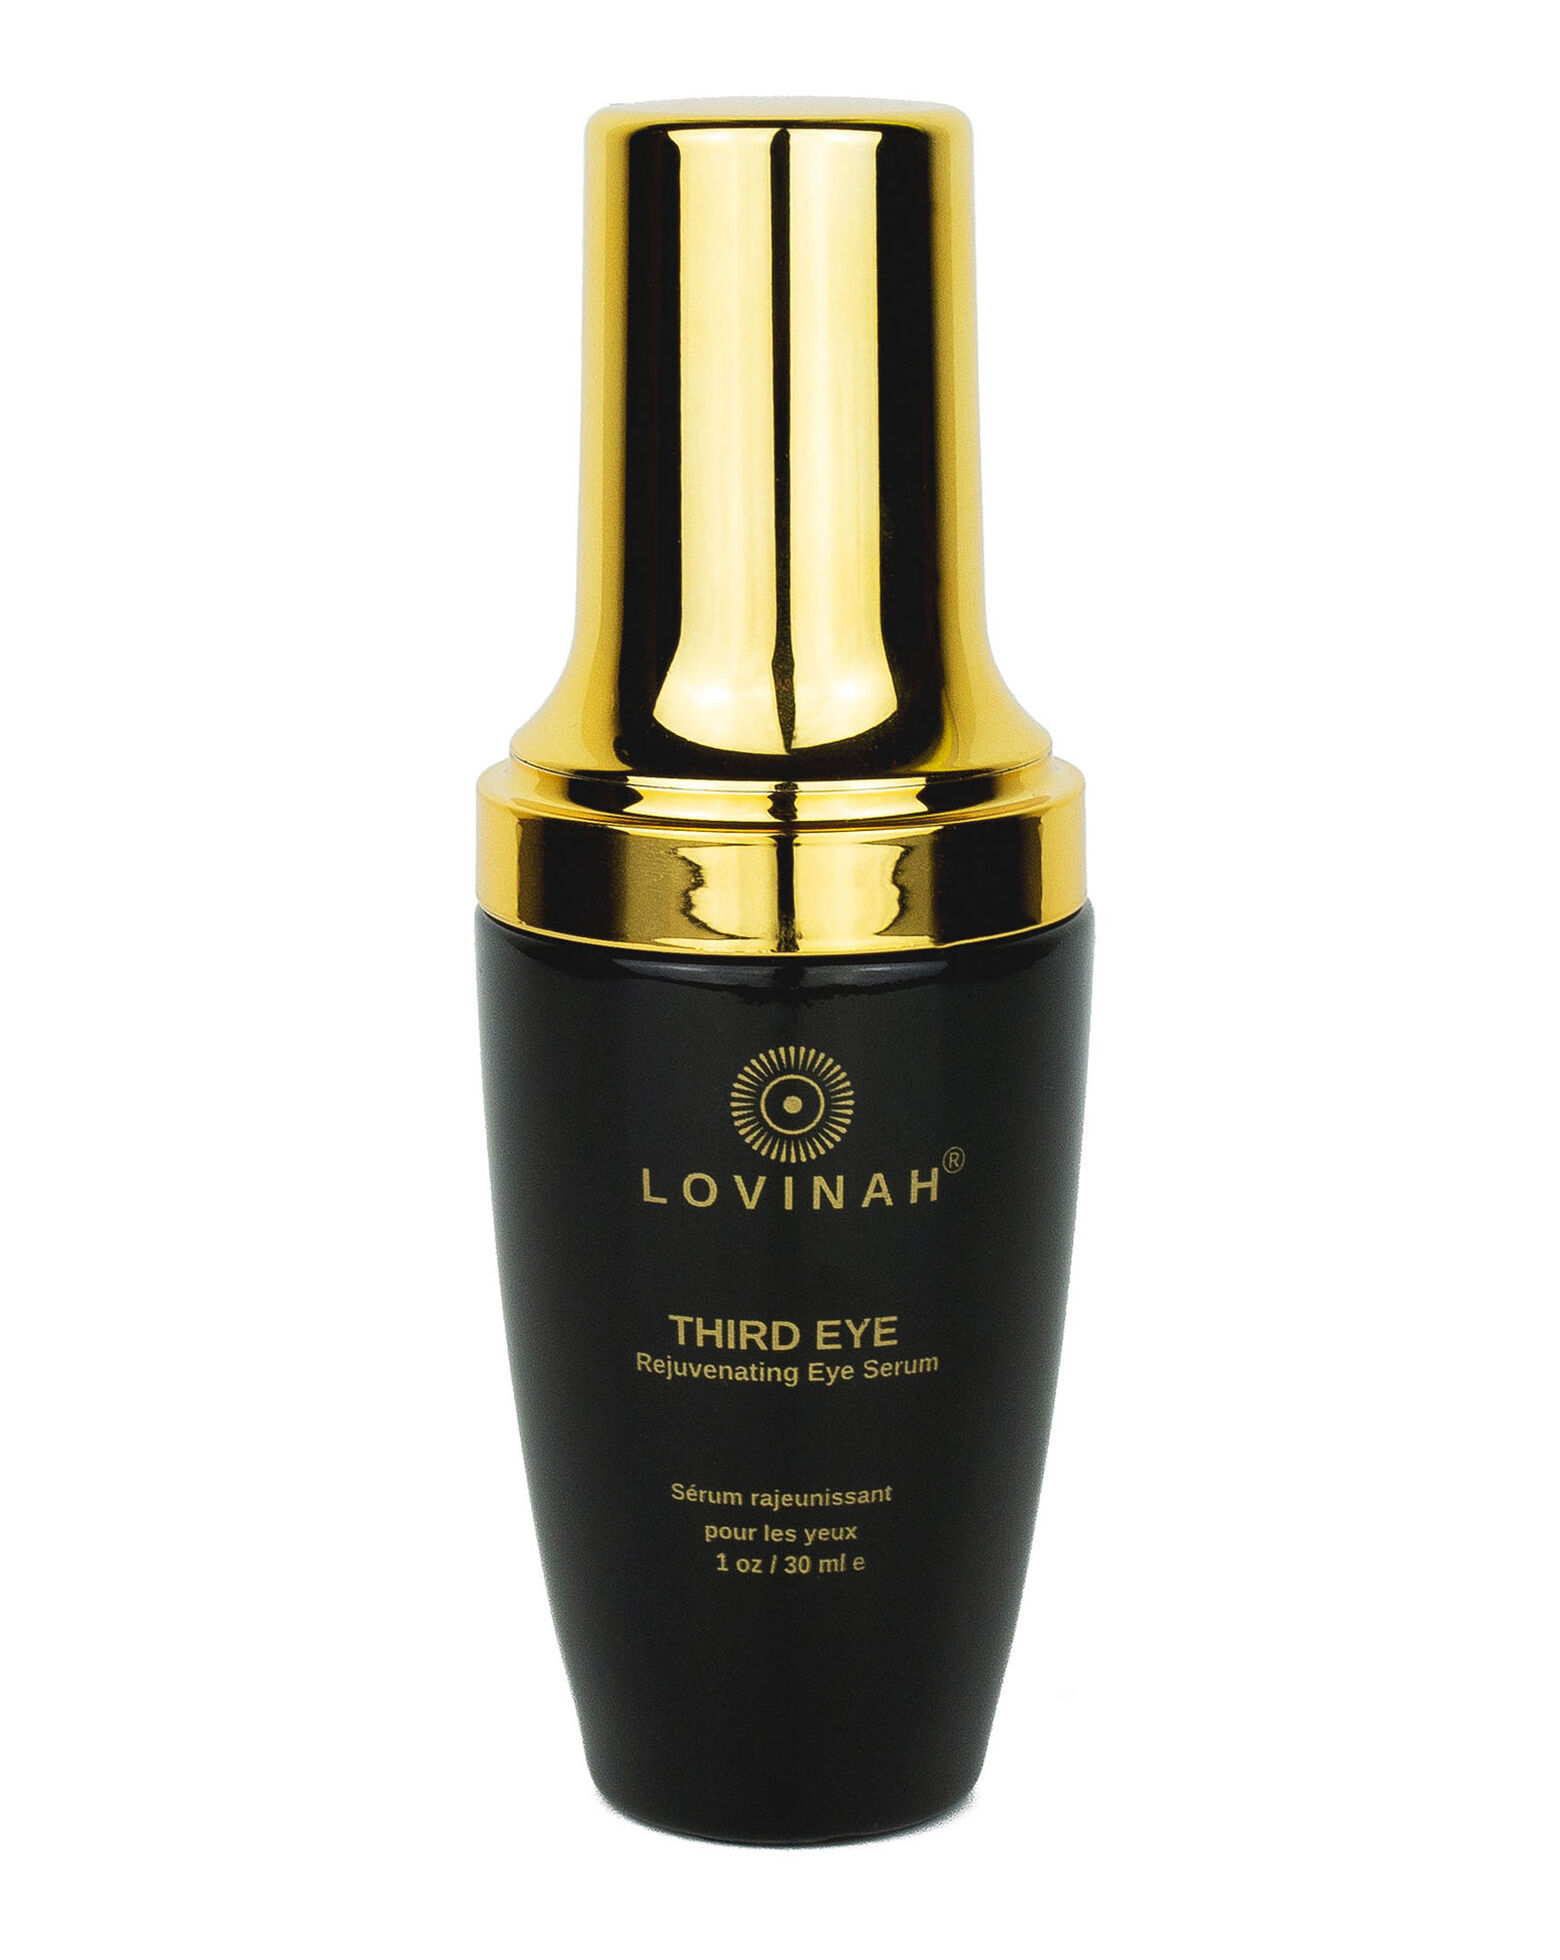 Lovinah - Third Eye Rejuvenating Eye Serum